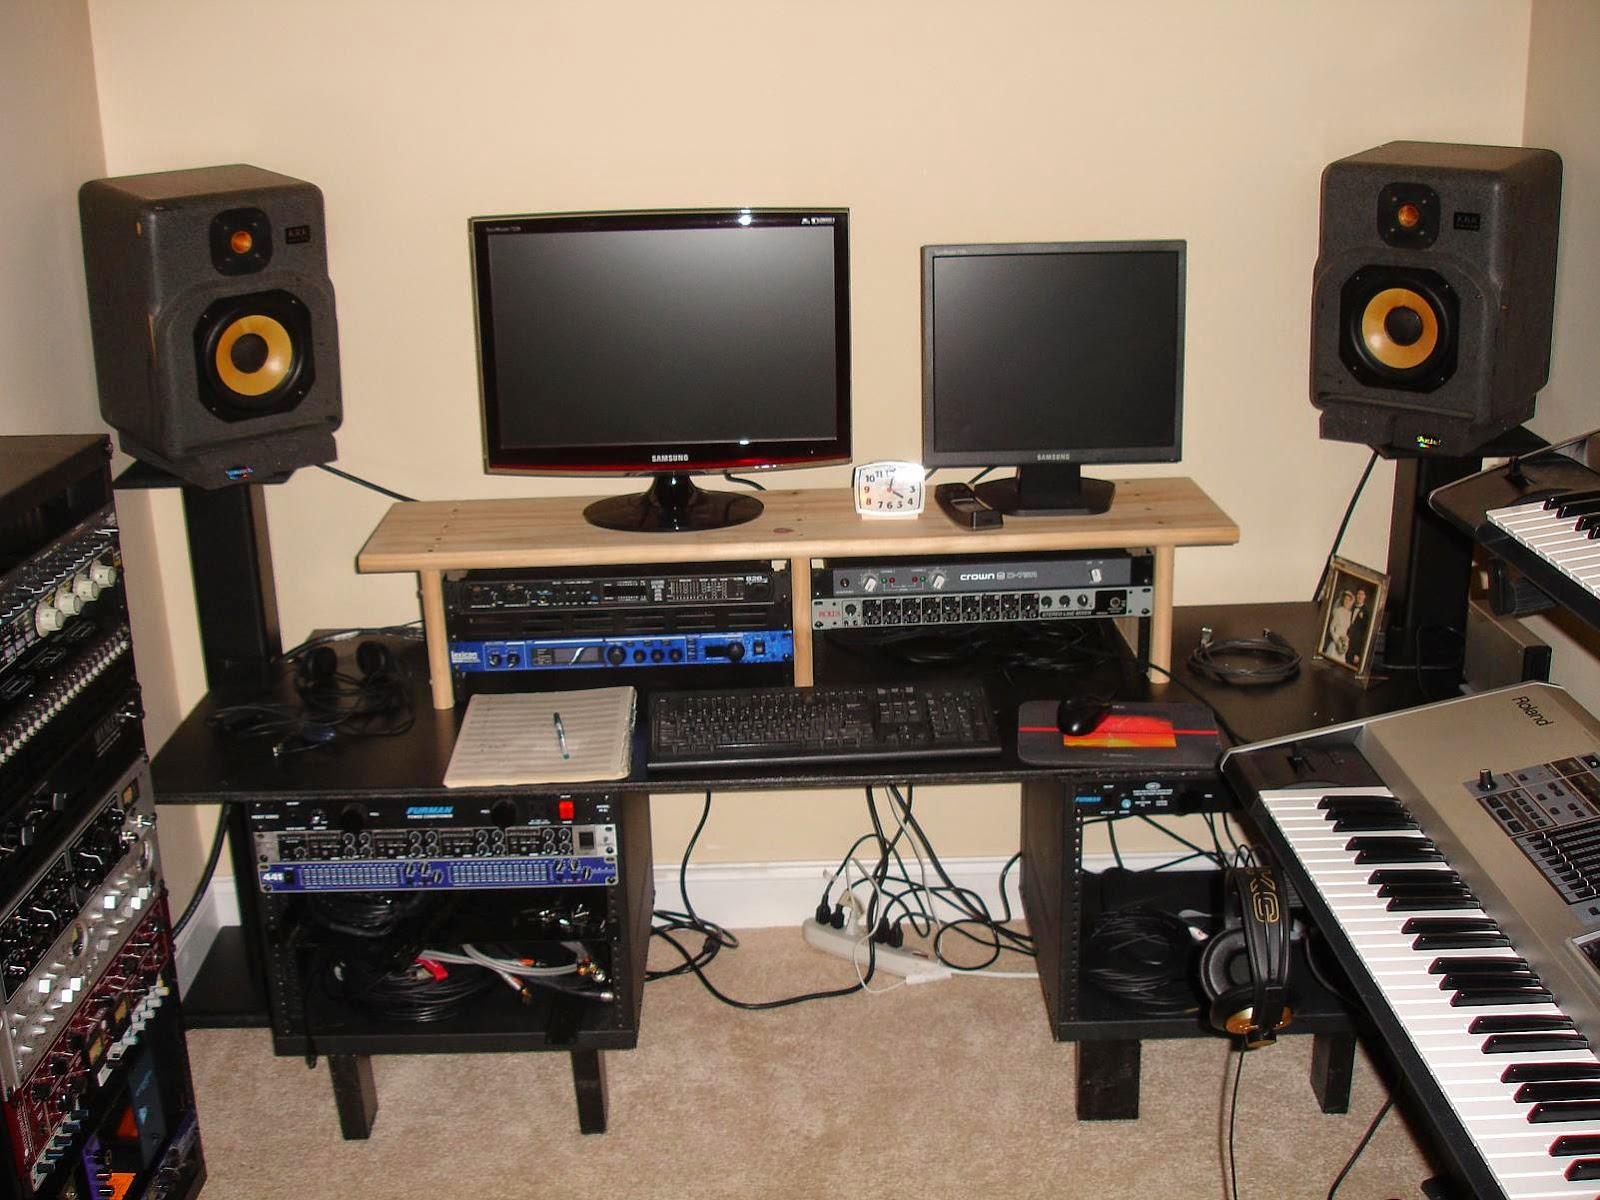 Fine E Novations Setup Up Your Own Home Recording Studio Largest Home Design Picture Inspirations Pitcheantrous